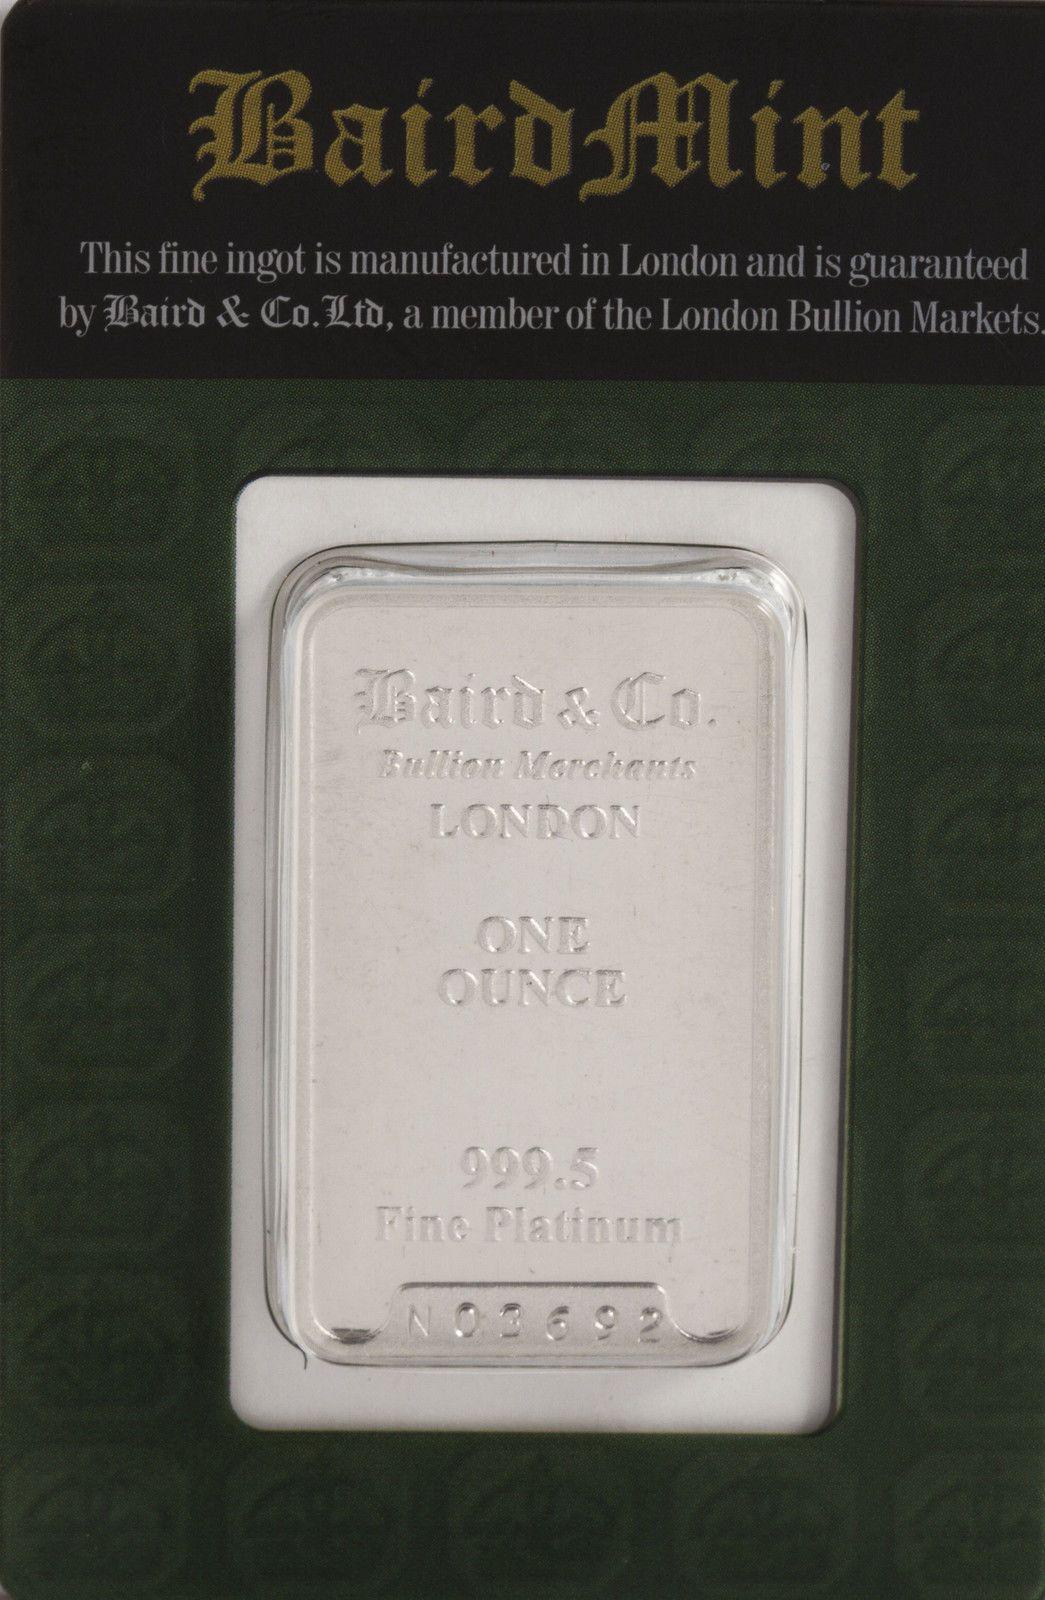 1oz Baird Mint 9995 Platinum Bar With Images Baird Mint Bar